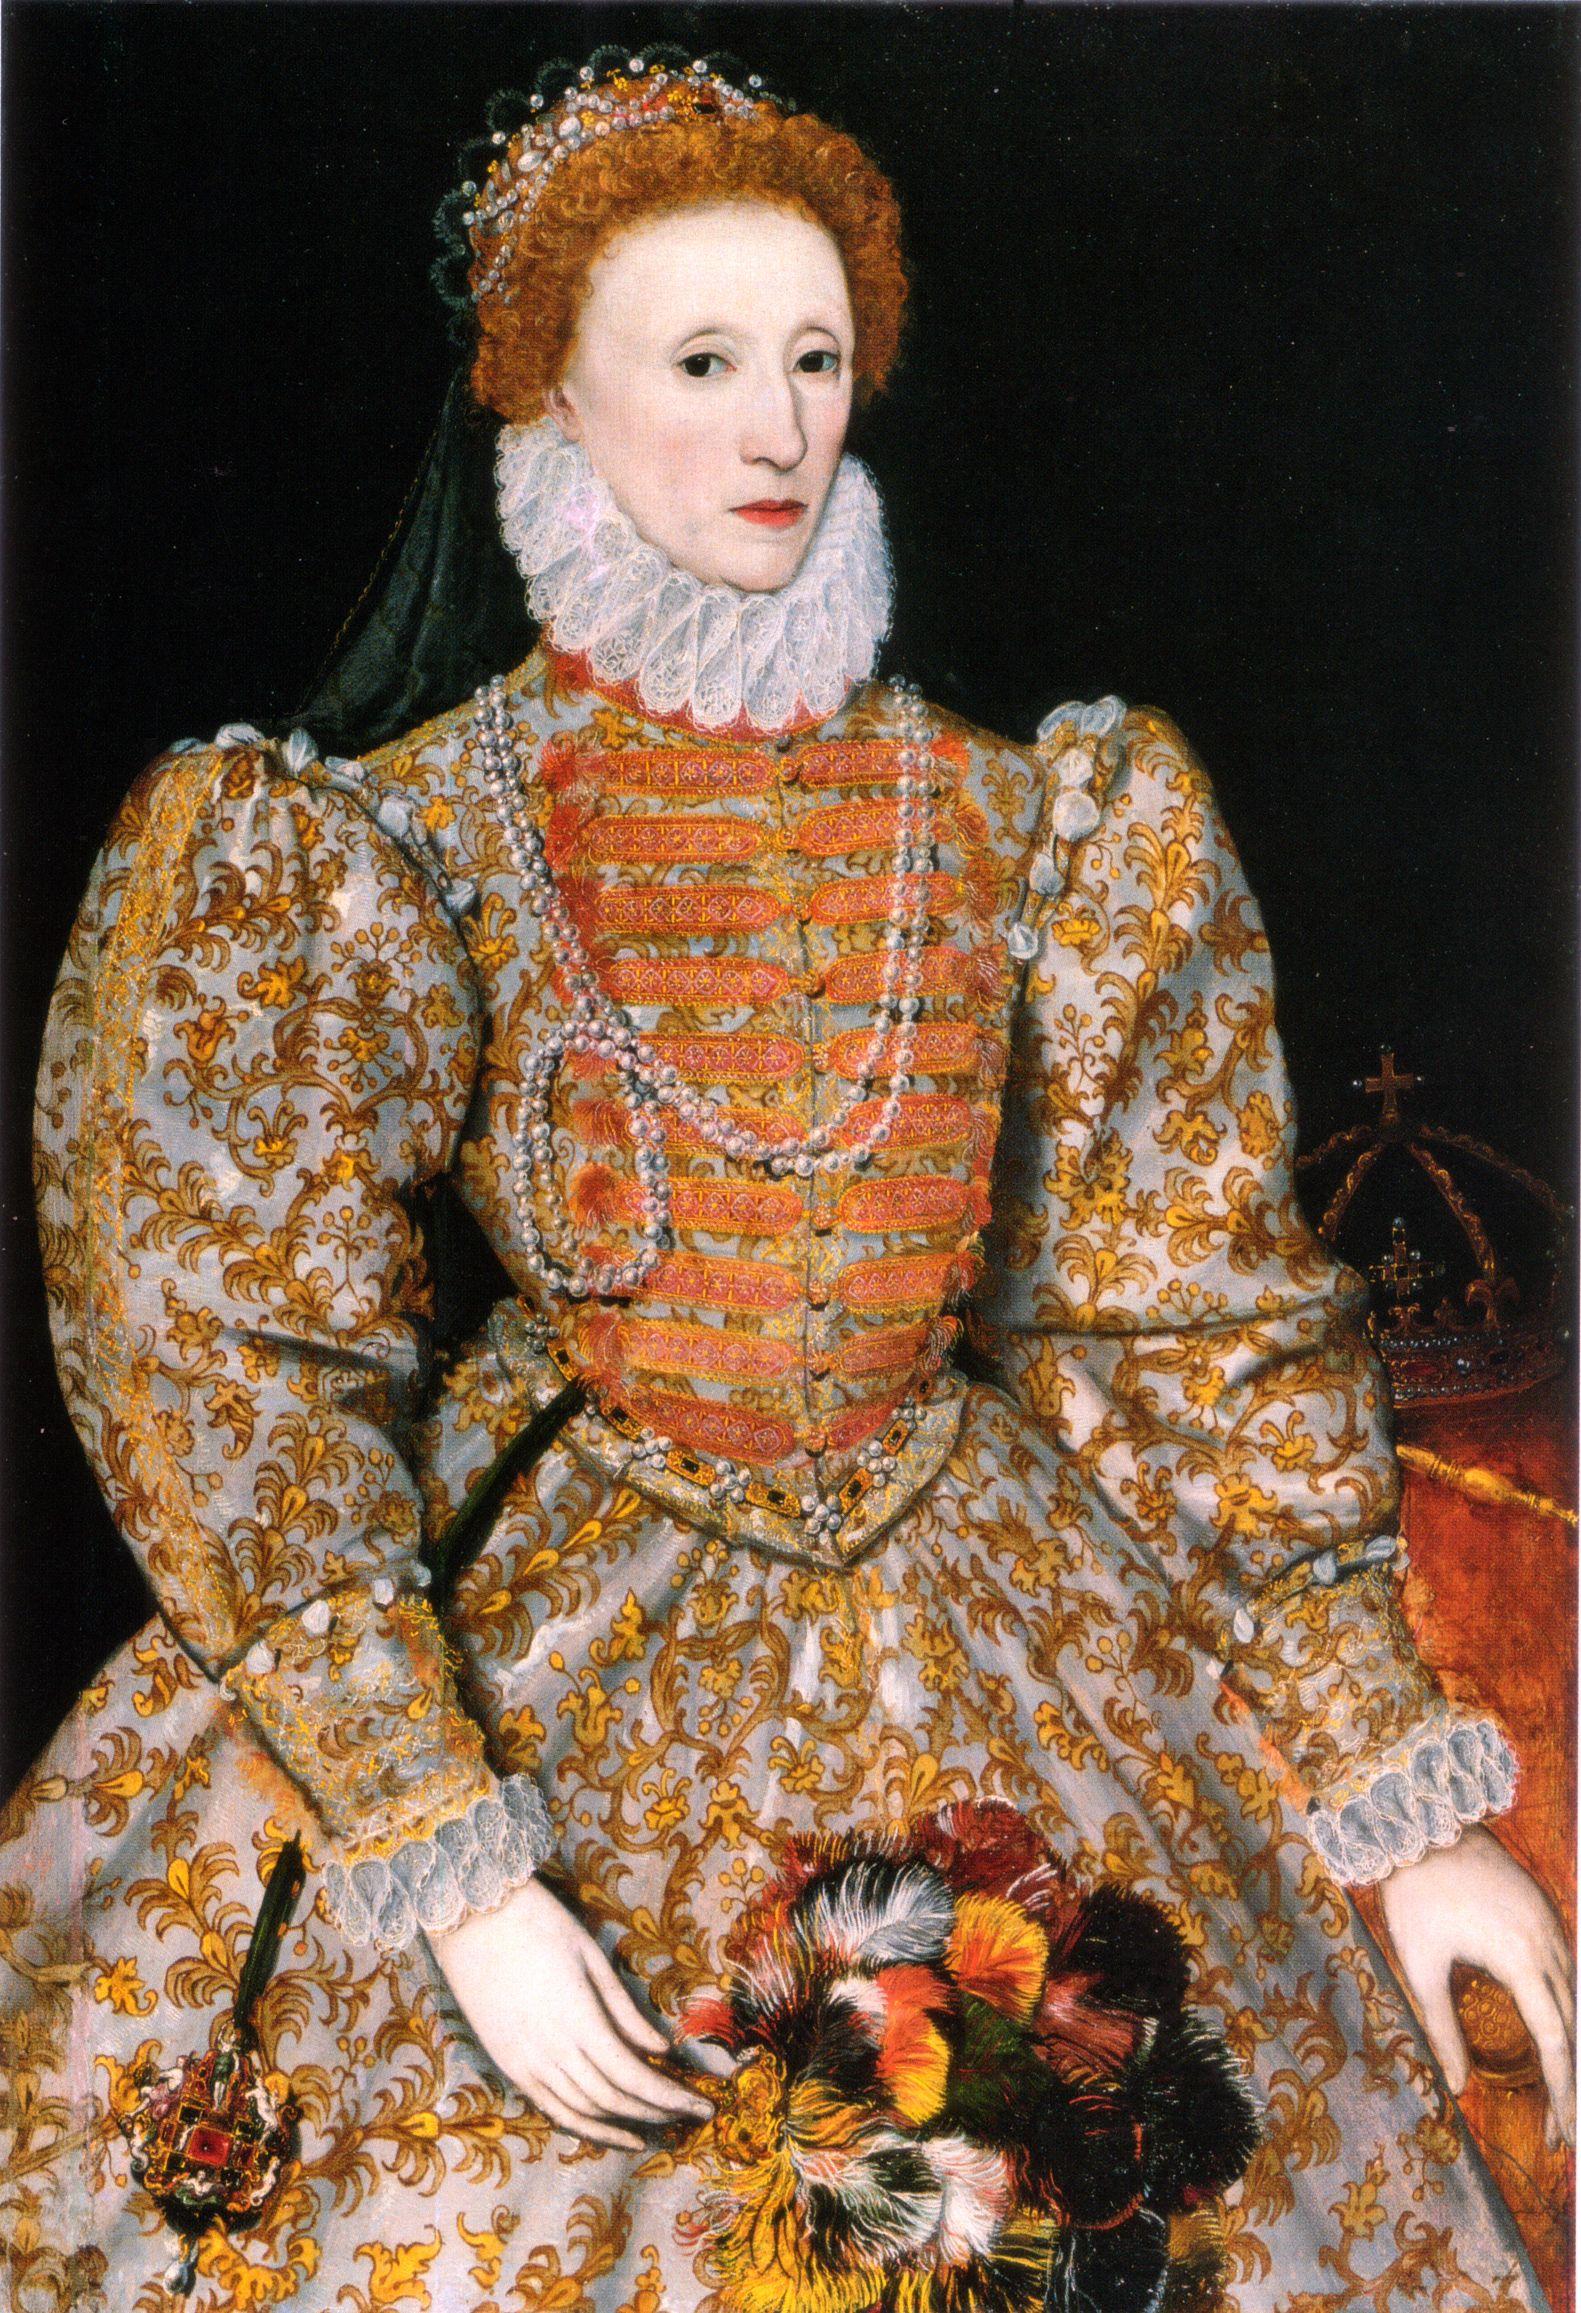 Elizabeth I of England (r. 15581603), the daughter of